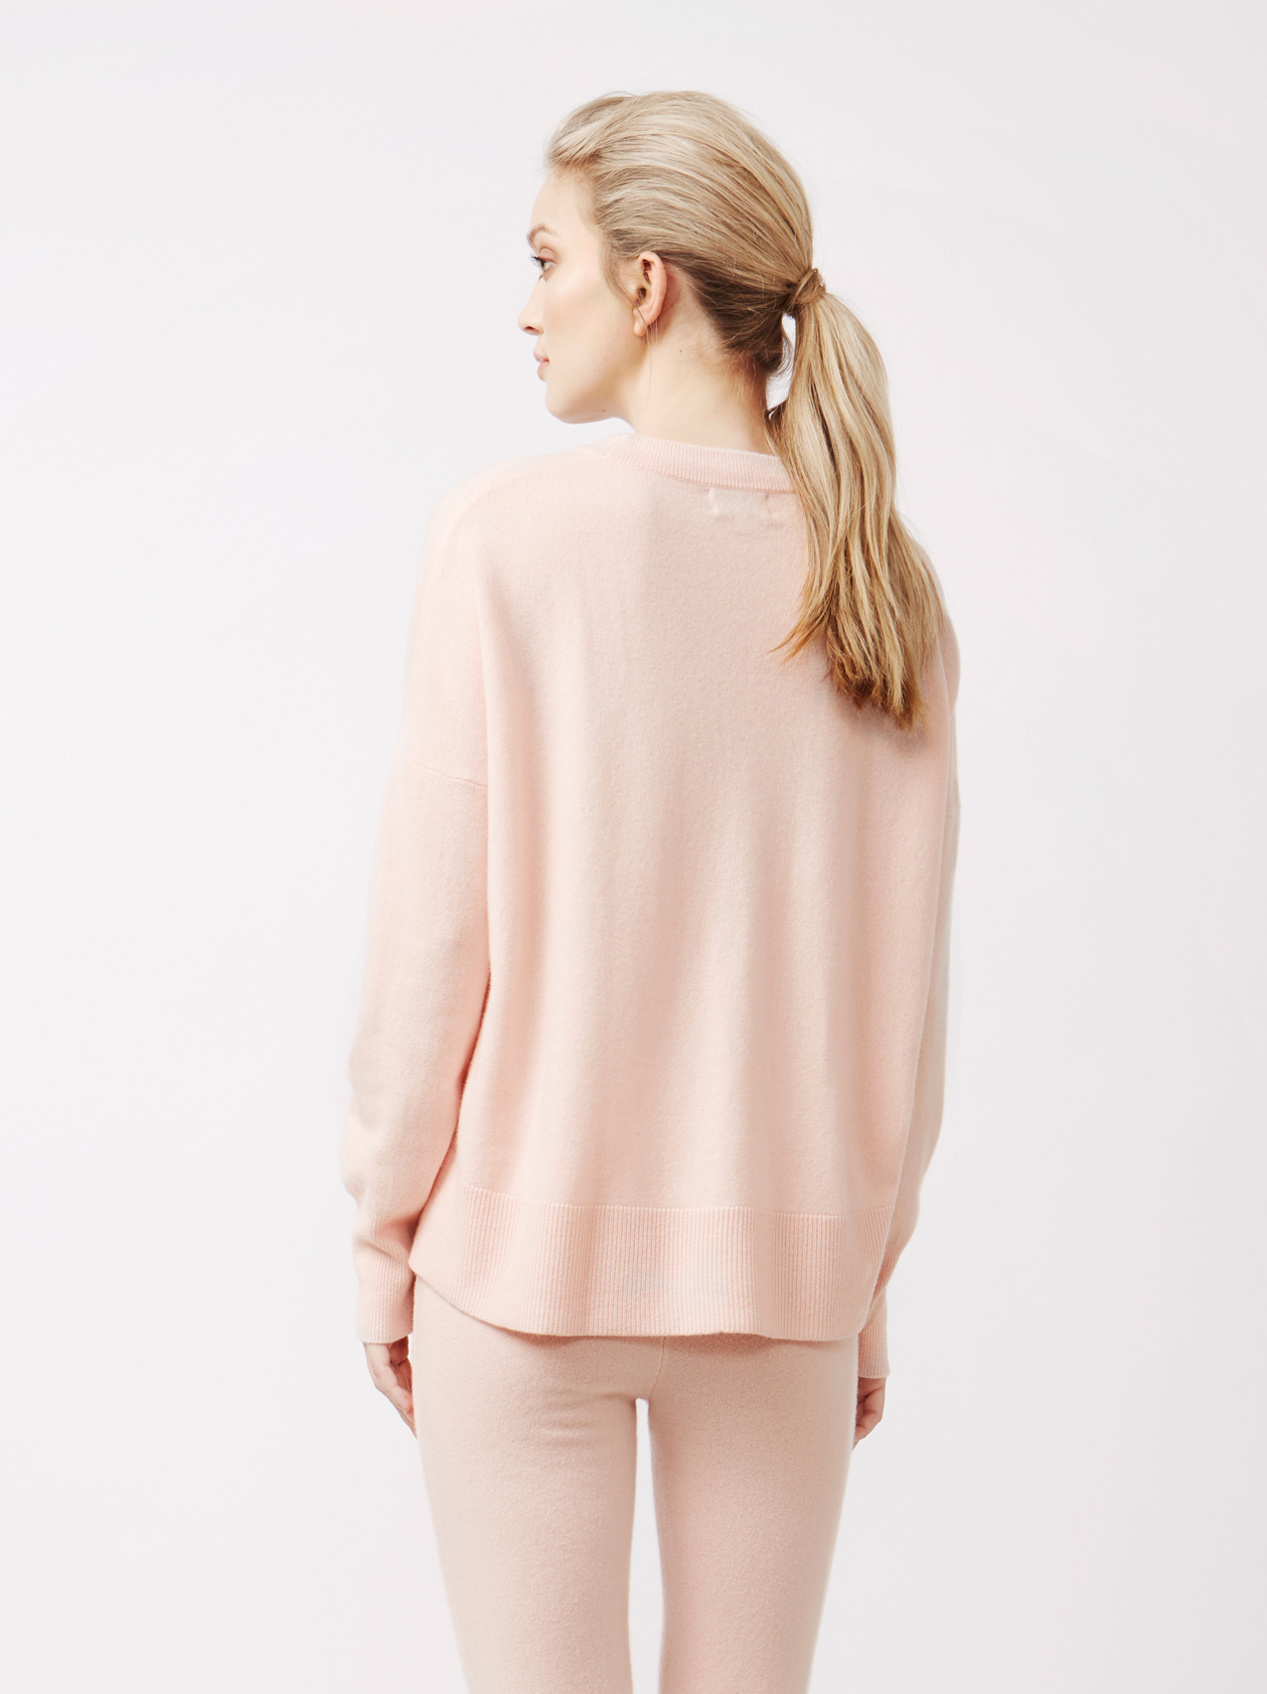 Soft Goat Women's Boyfriend Sweater Powder